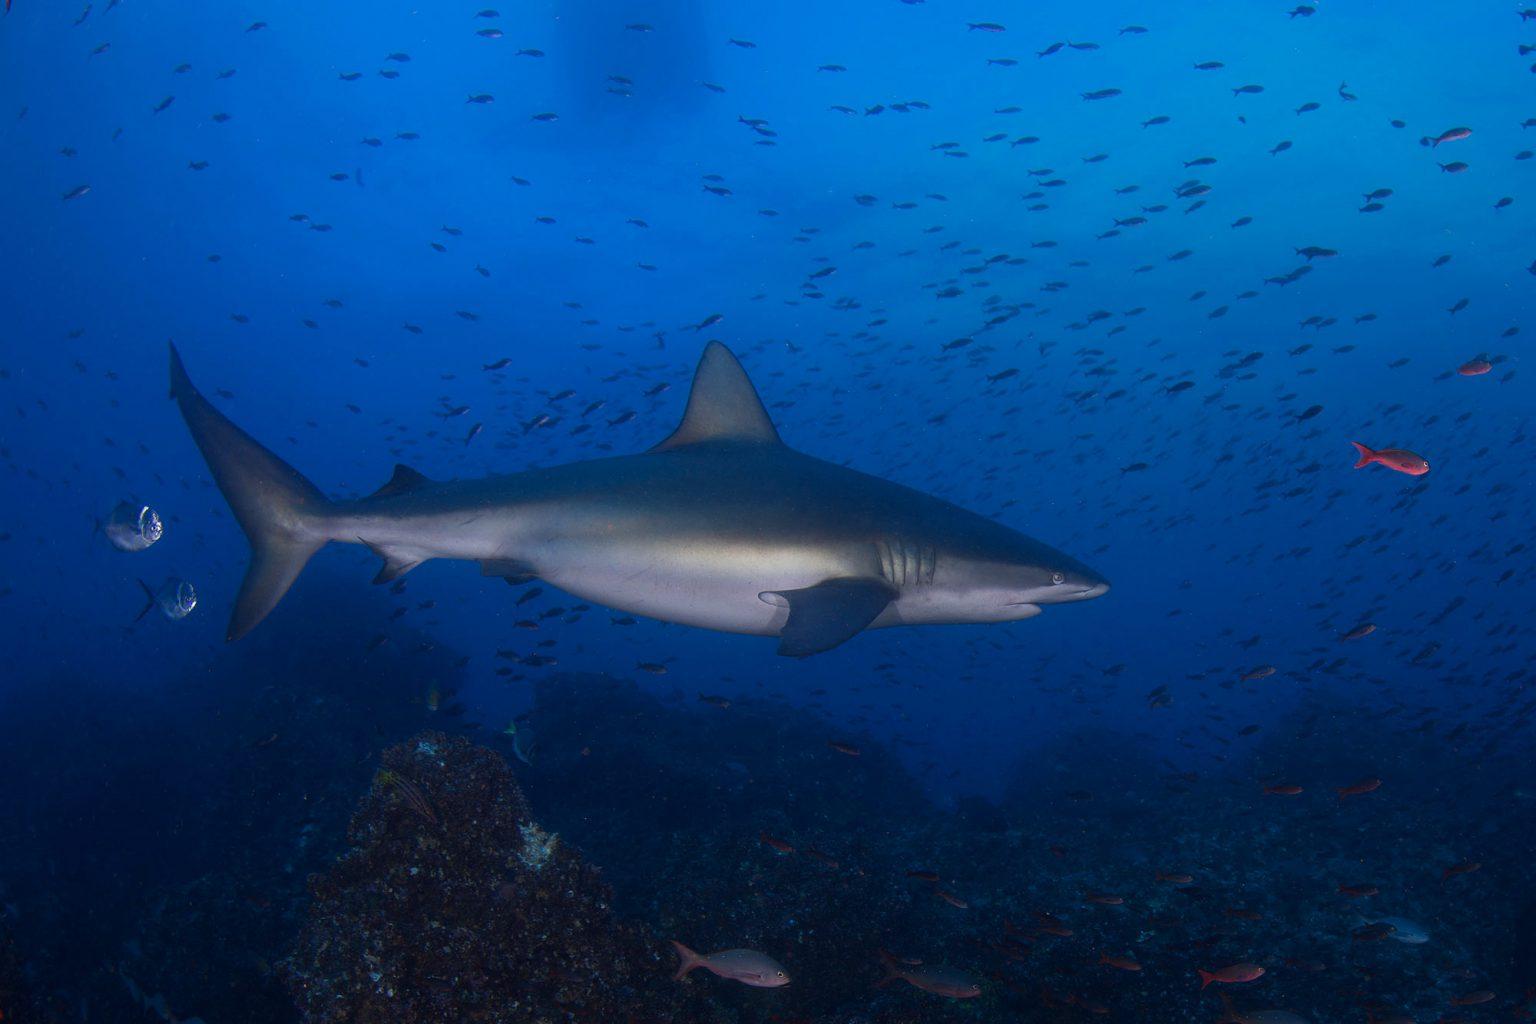 Galapagos Shark, Hai